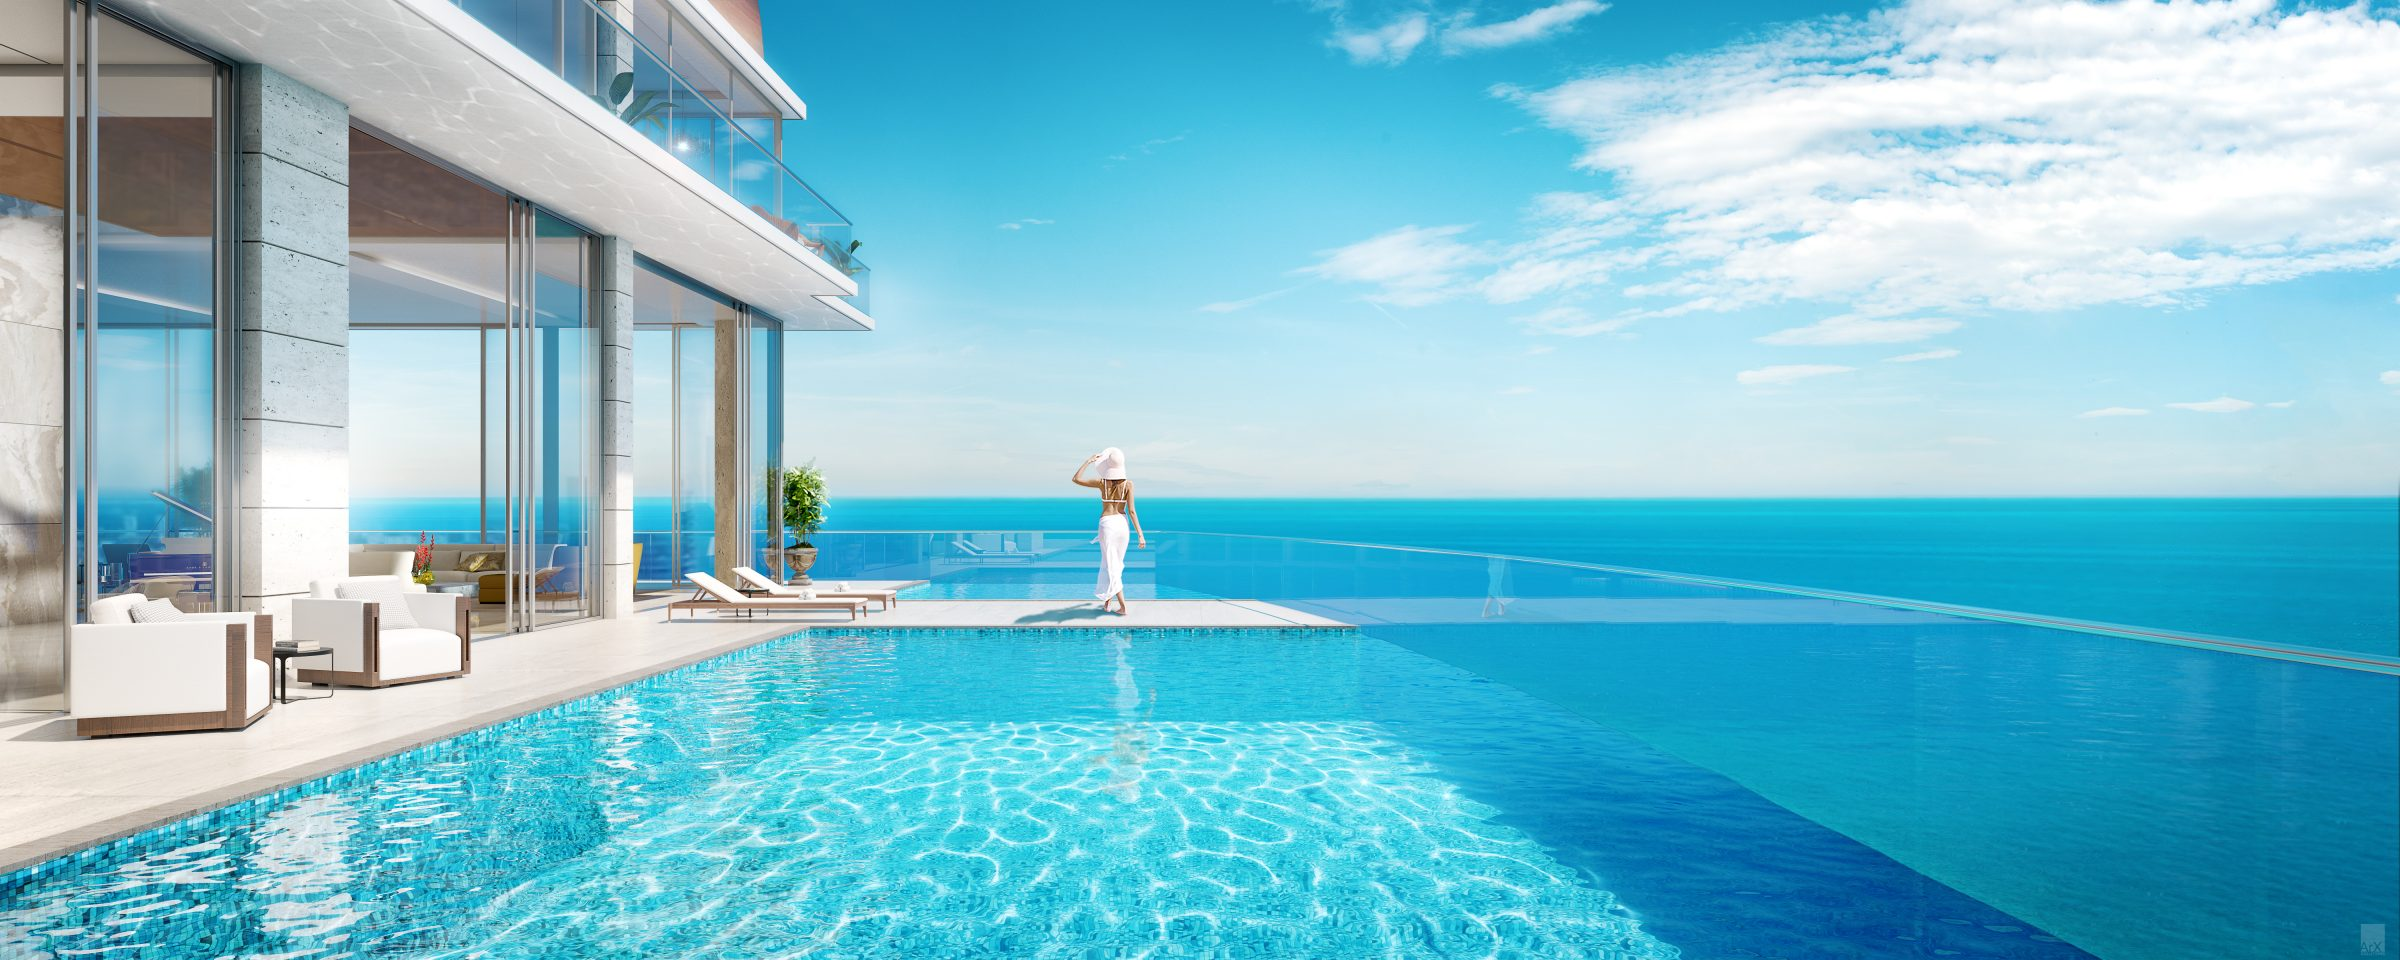 09-Casa-Di-Mare-Pool-2400x960.jpg